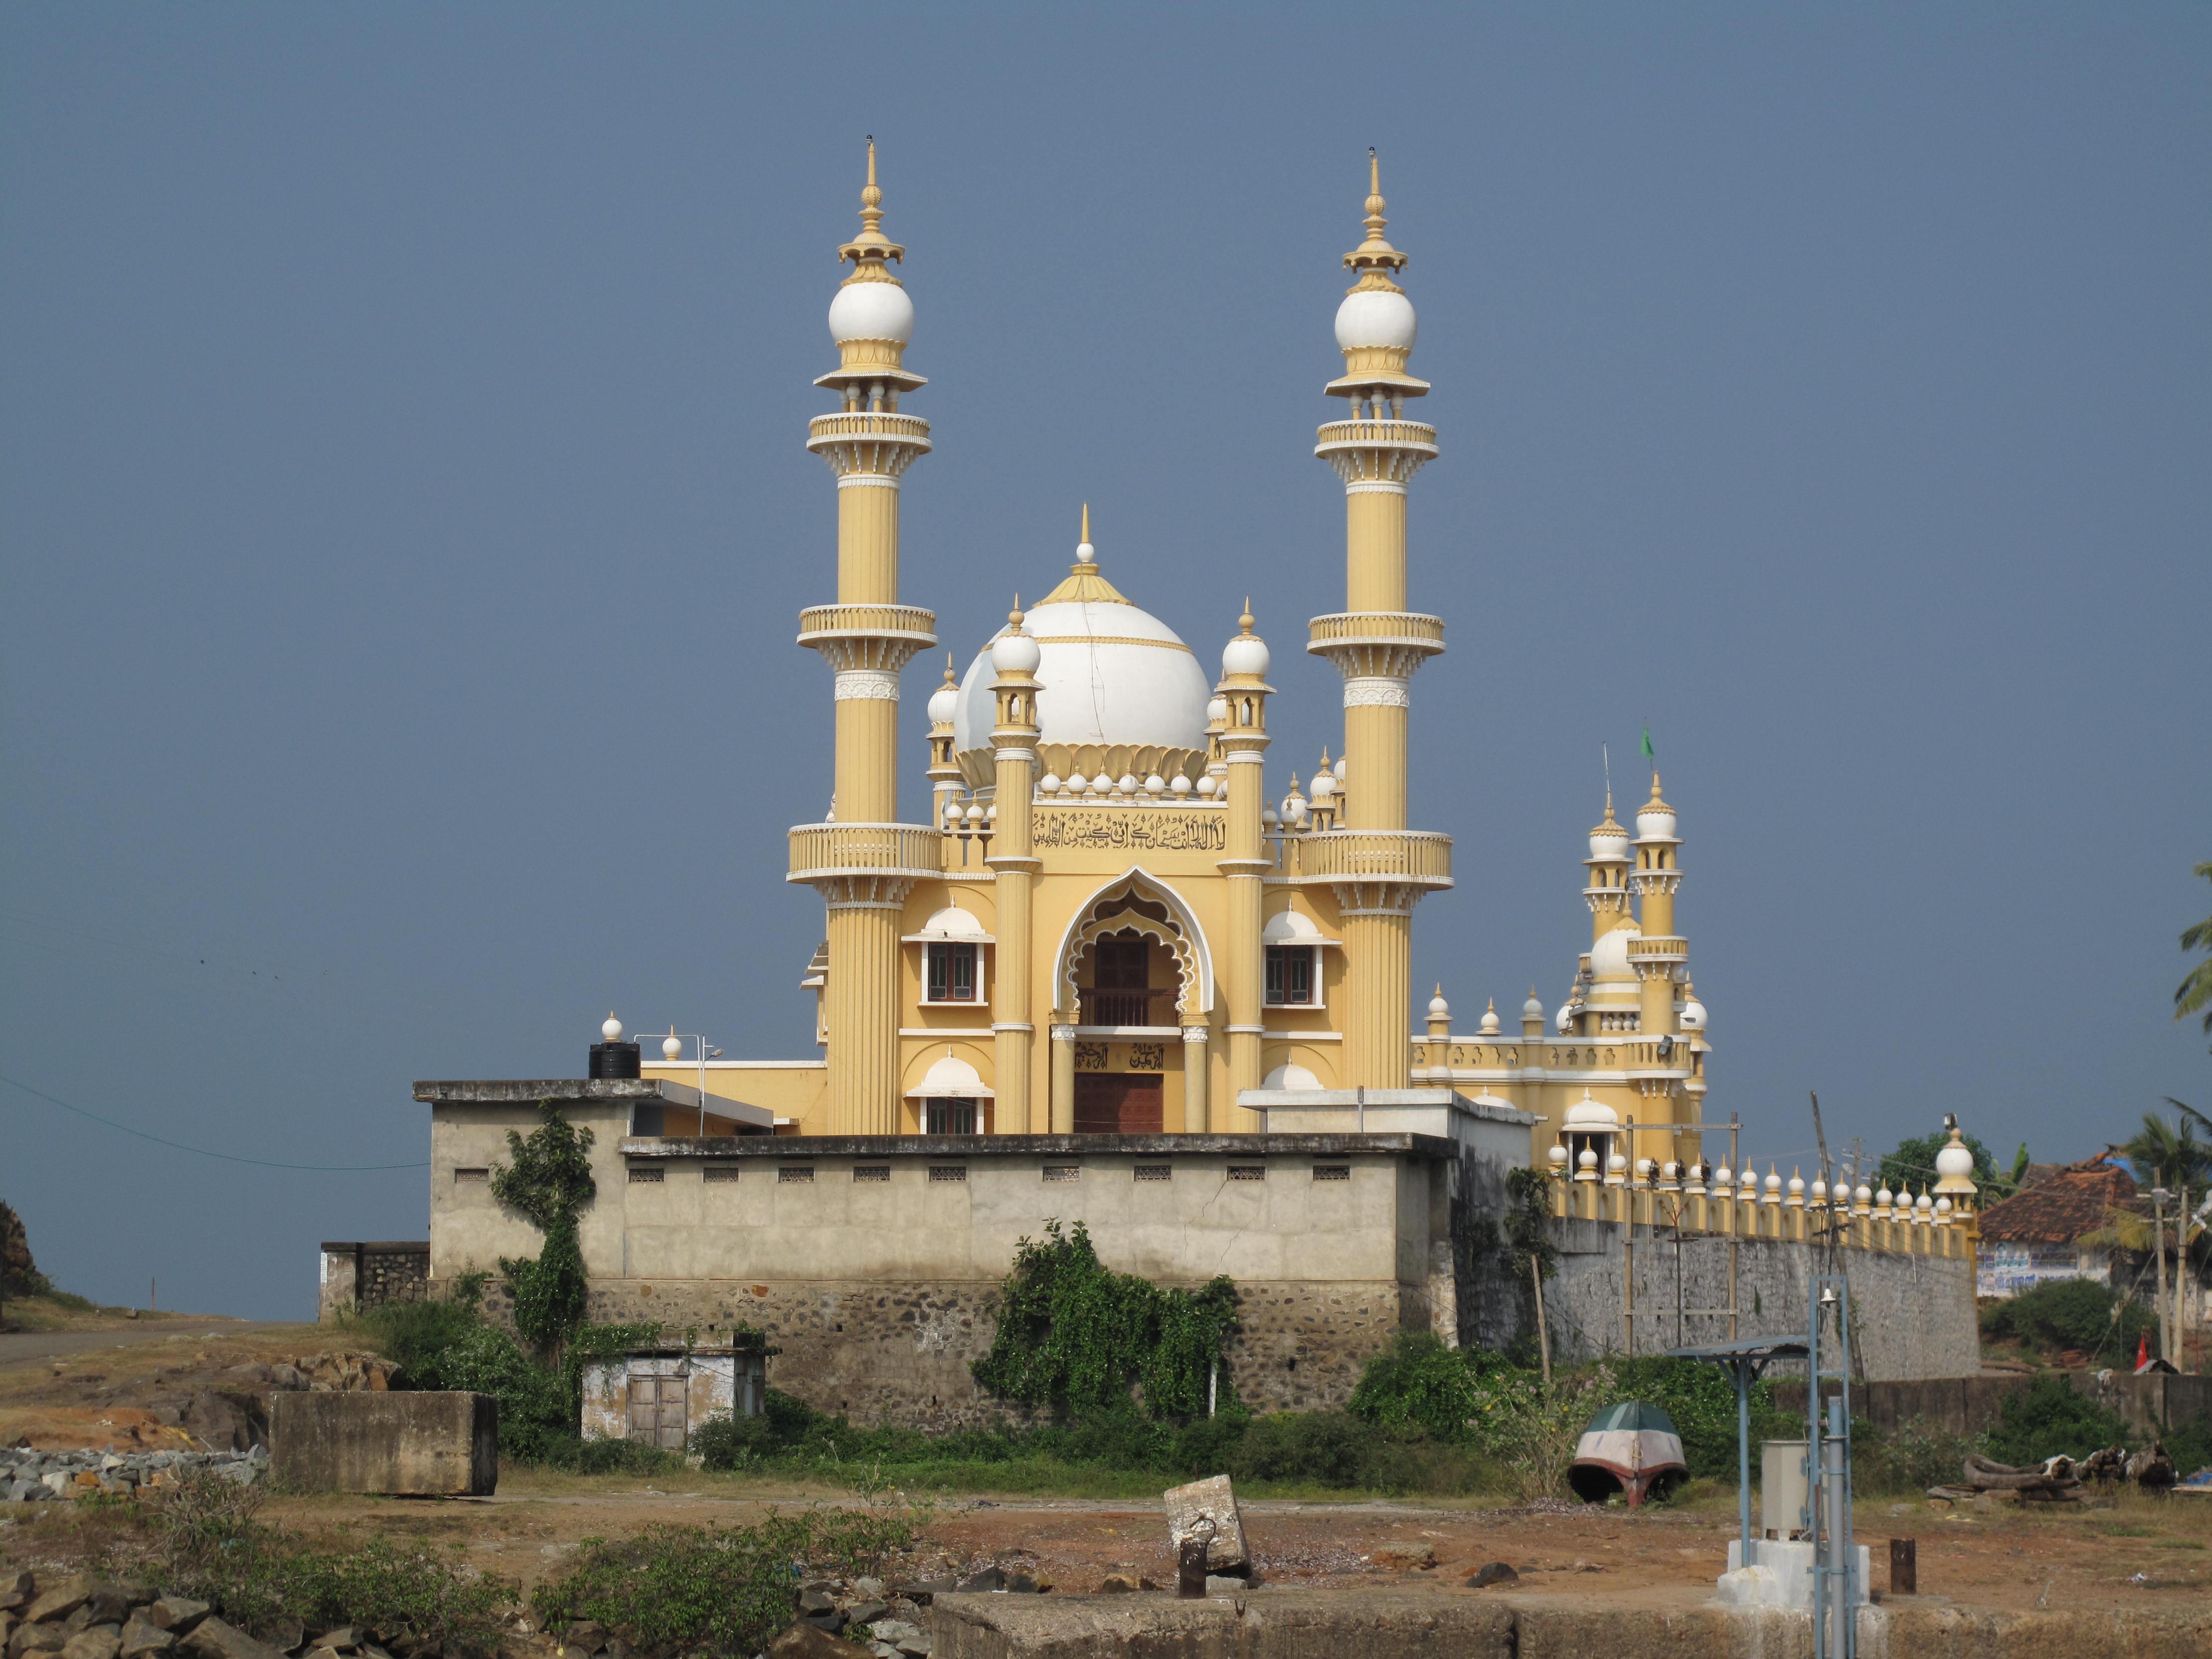 Mosque Wikipedia: File:20100105-Vizhinjam Mosque.JPG